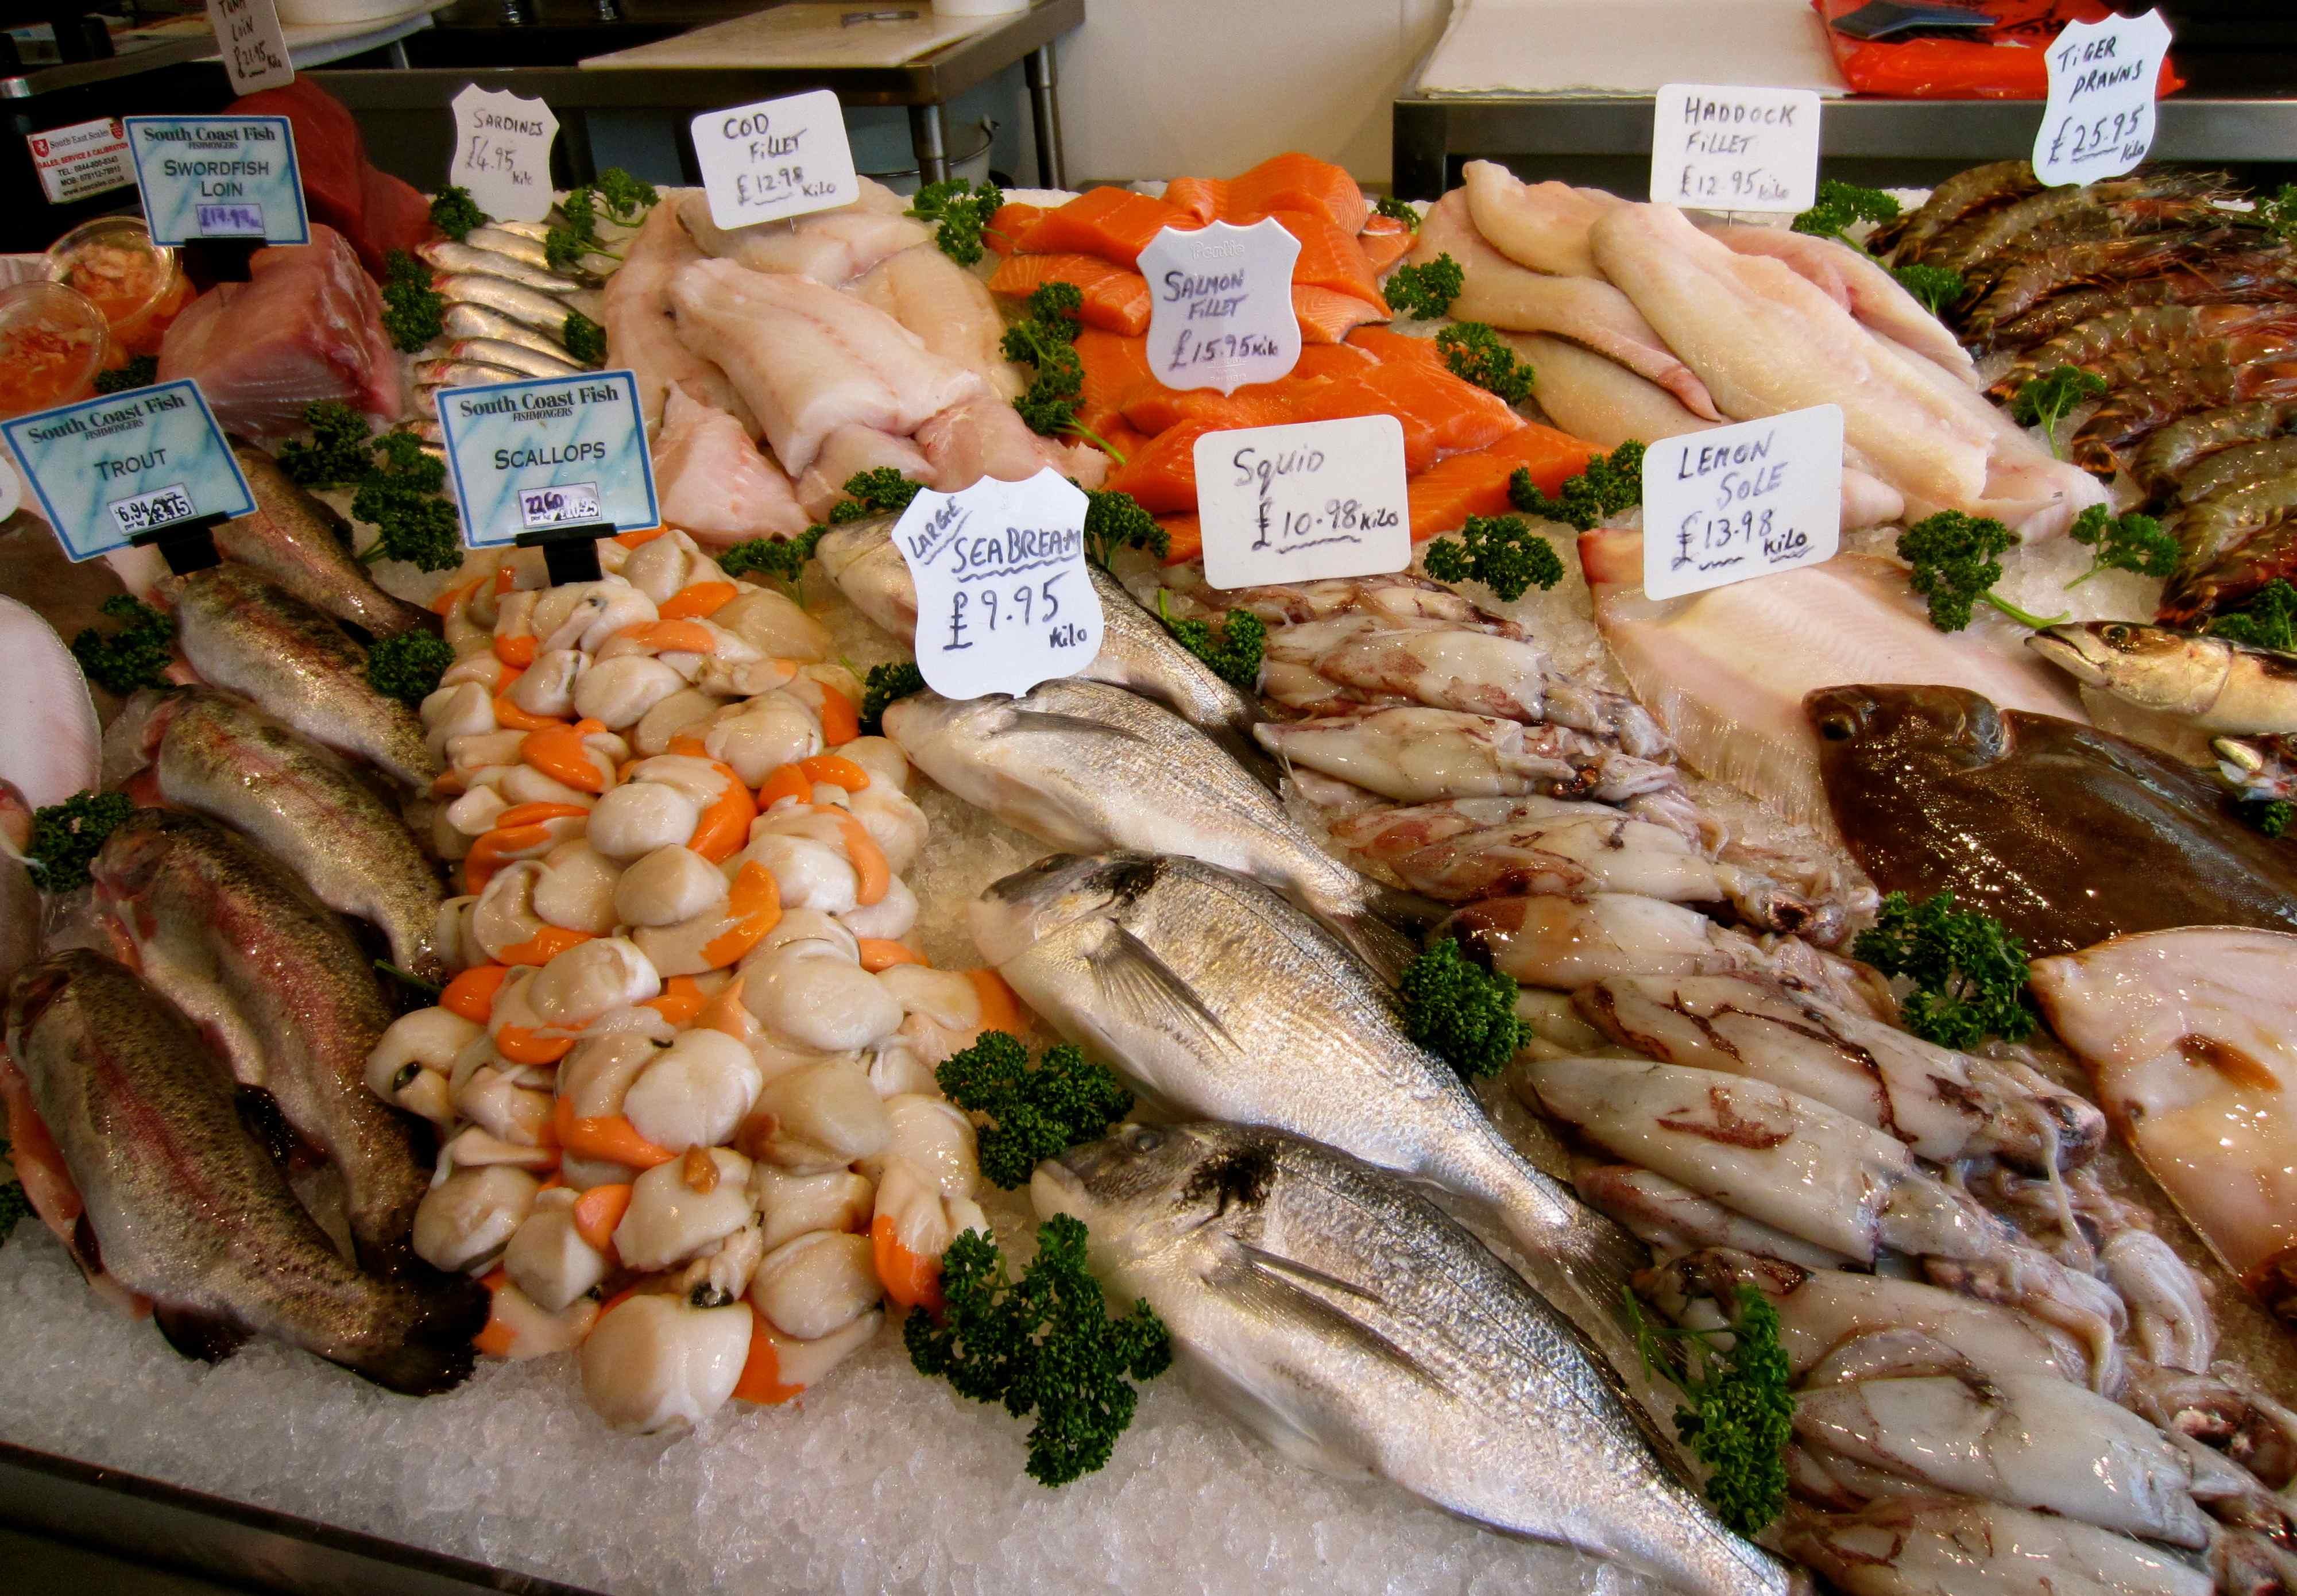 1000 images about fish market inspiration shop on pinterest for Fish market design ideas